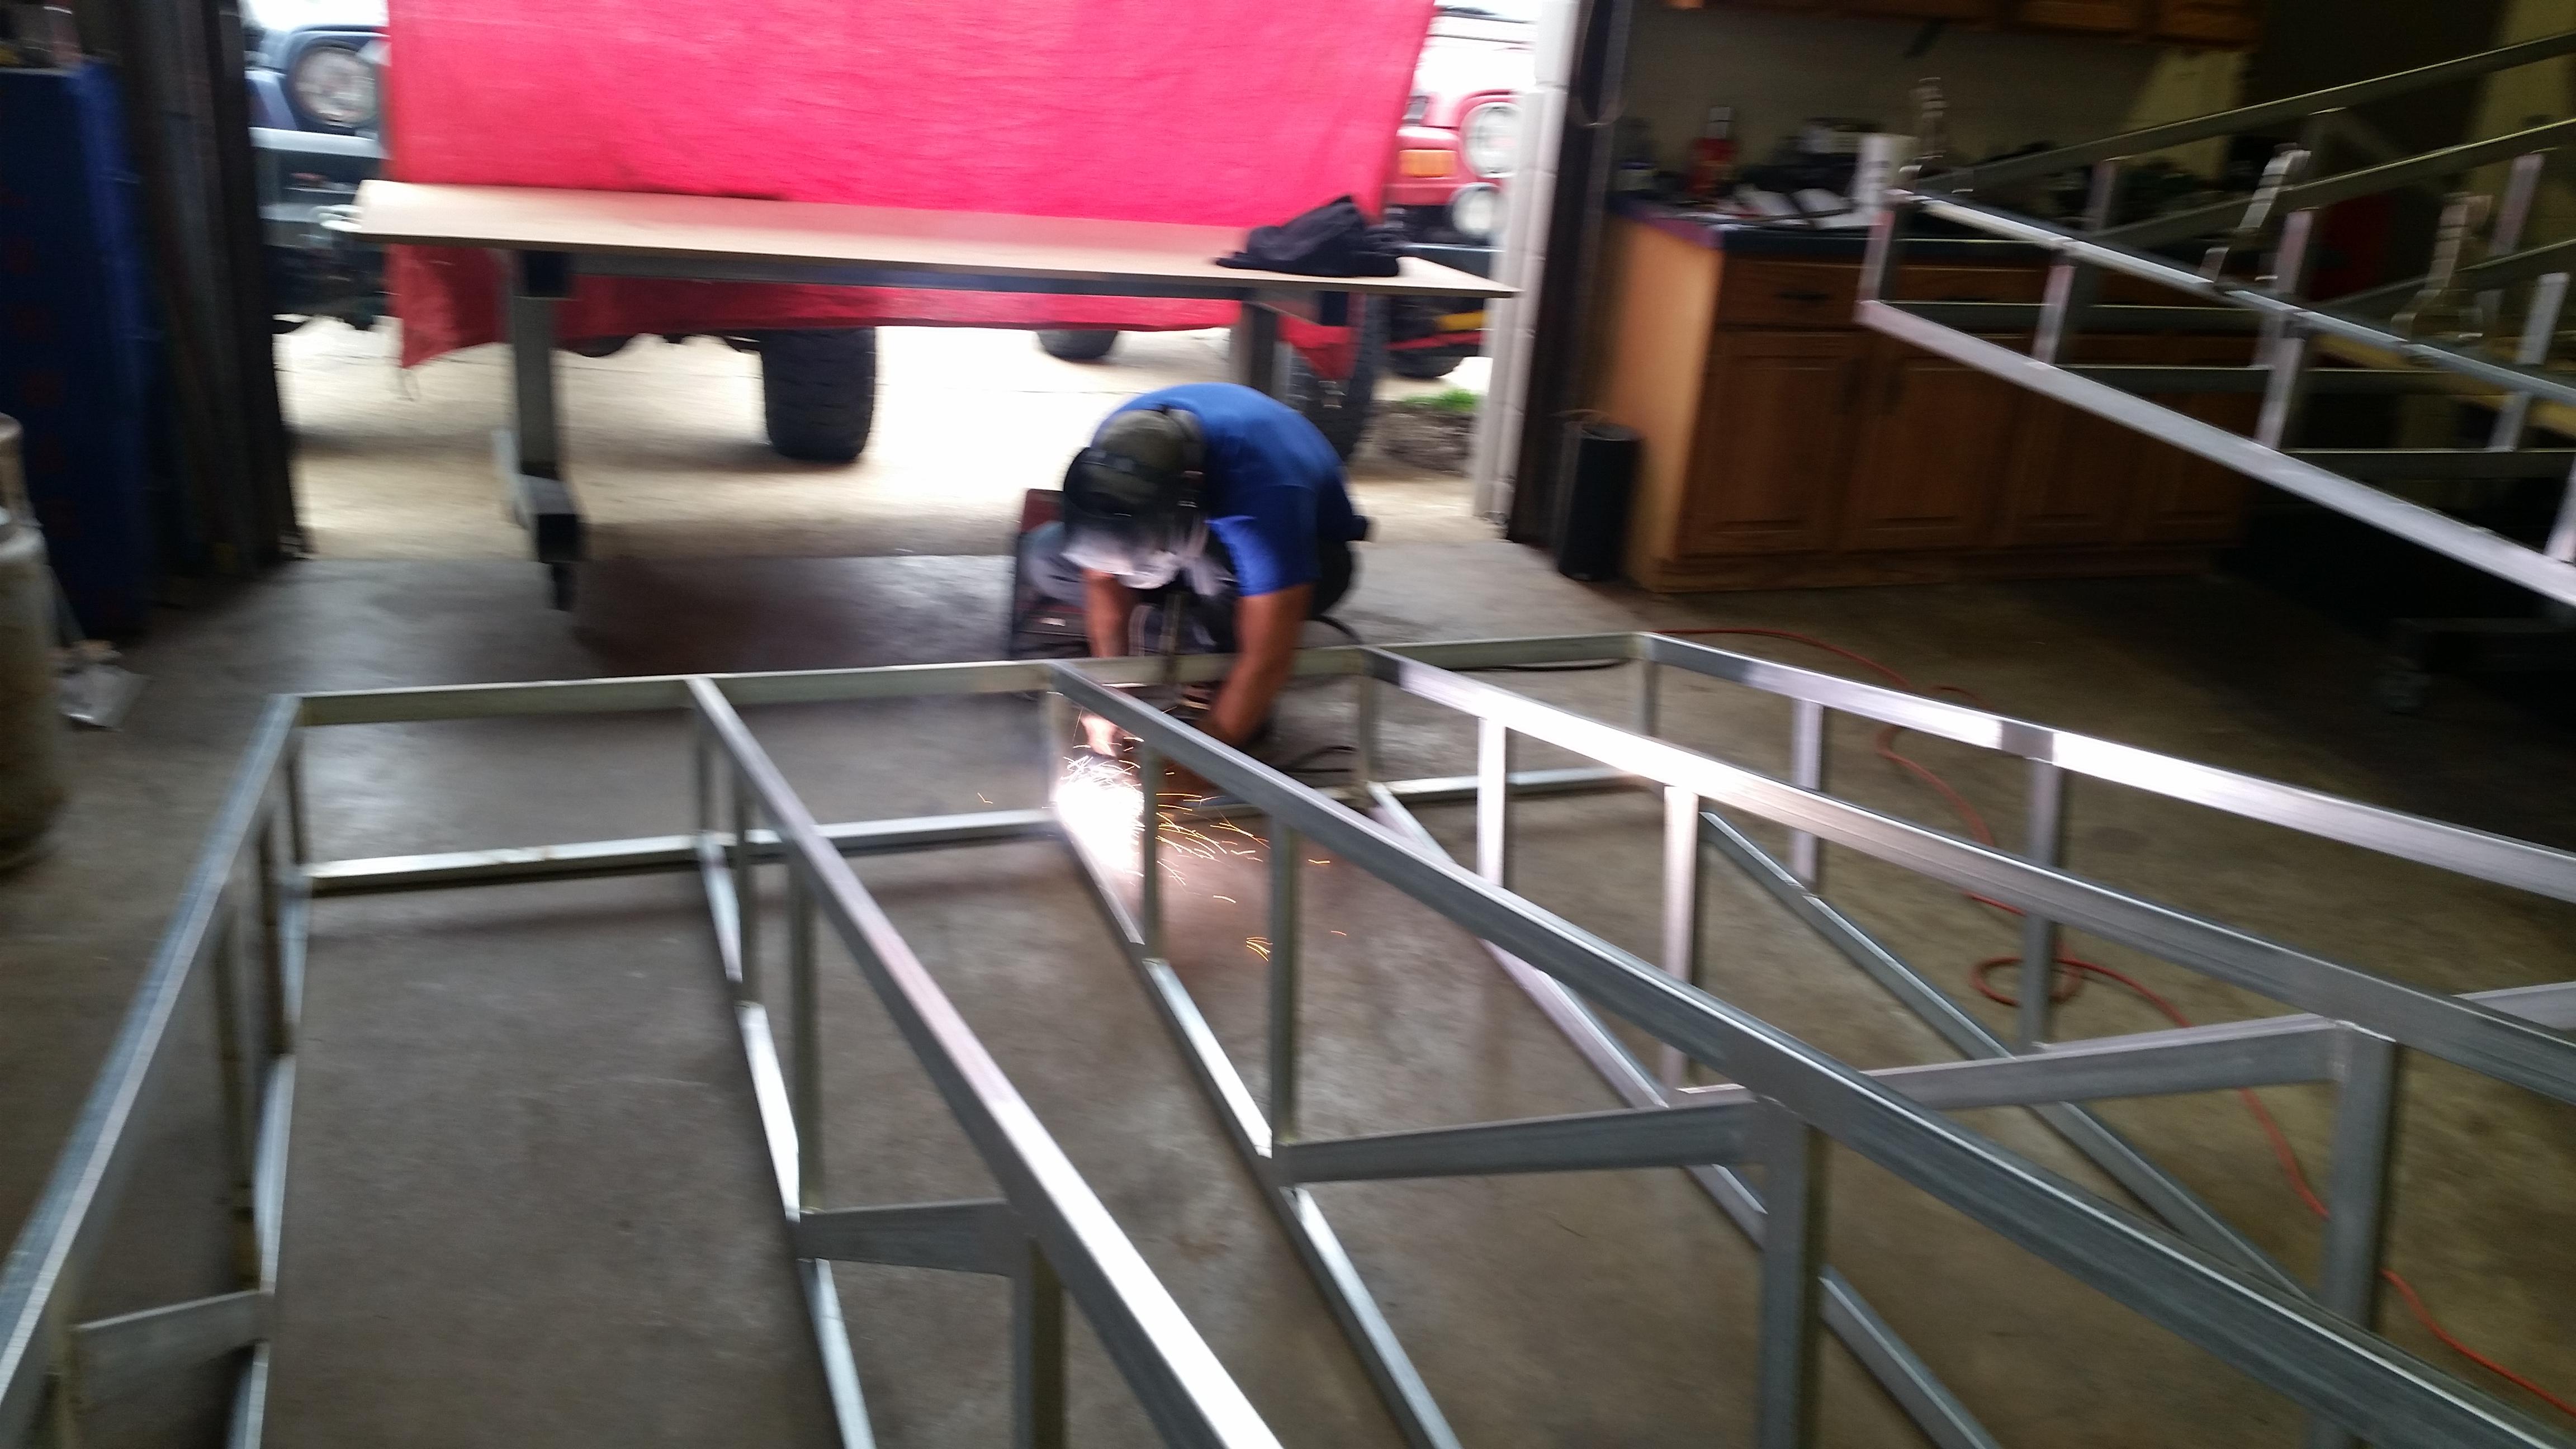 Welding steel awning frame